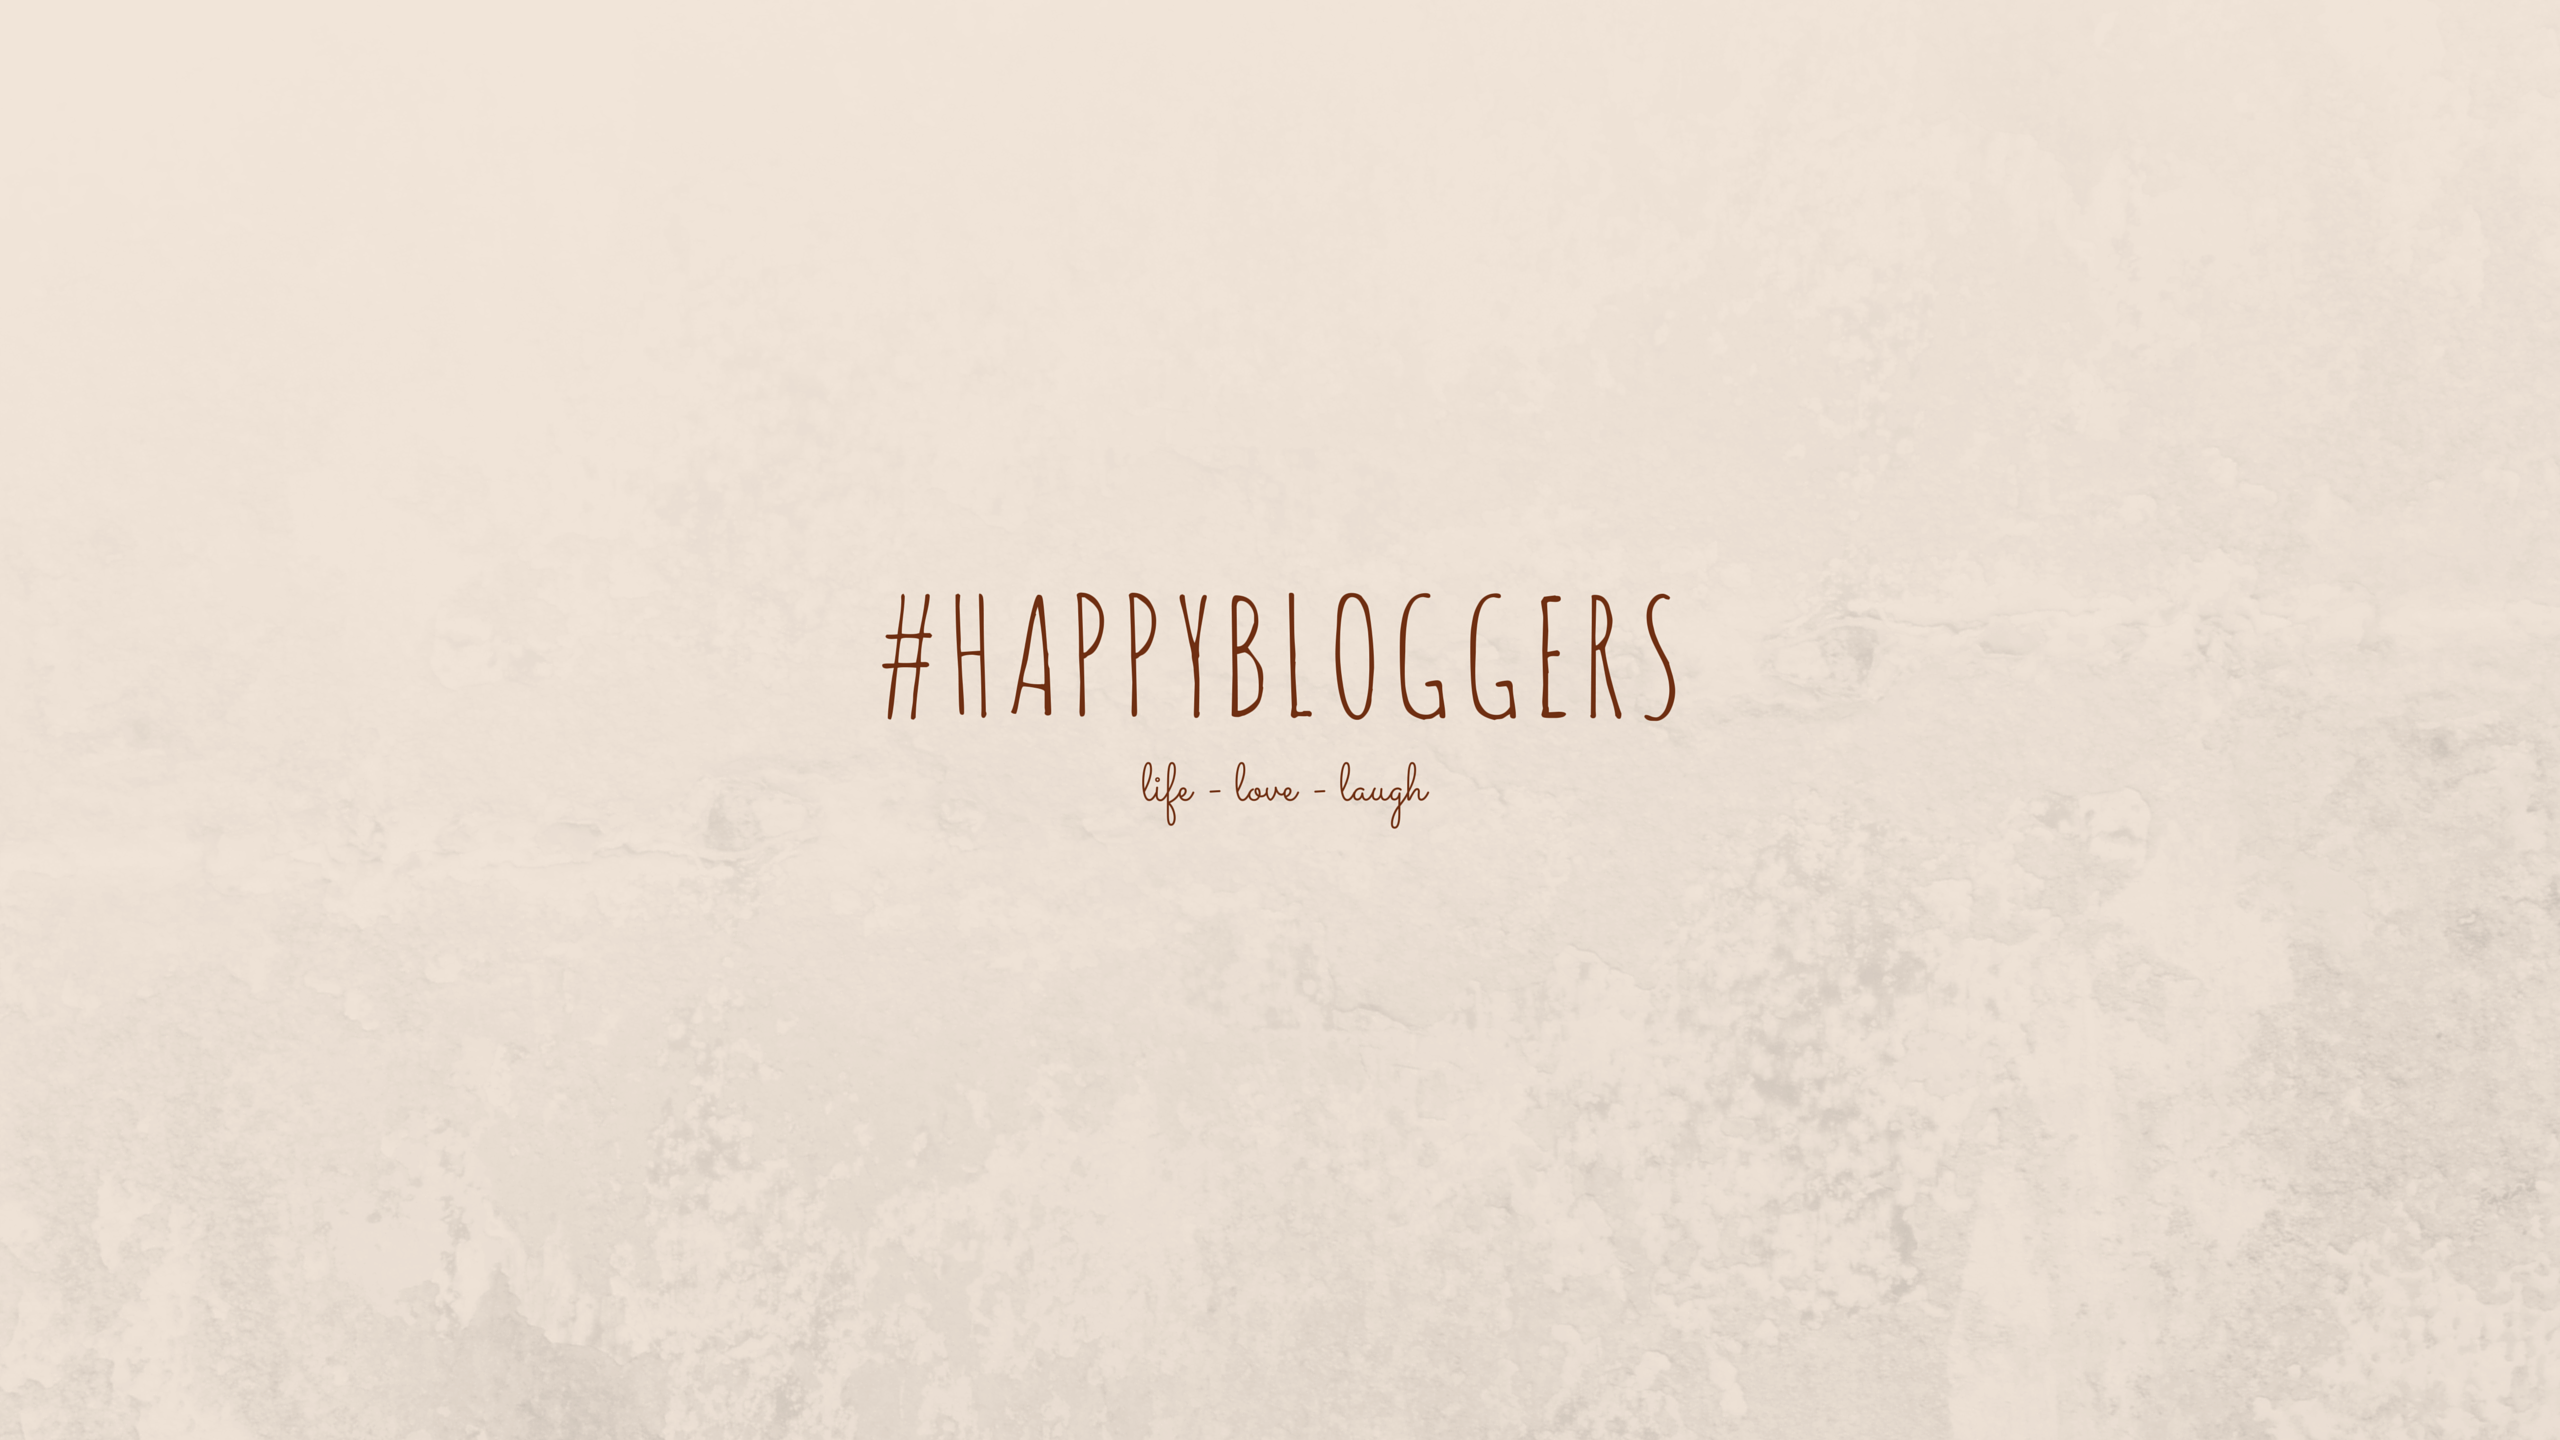 #happybloggers-54937-descalzaporelparque